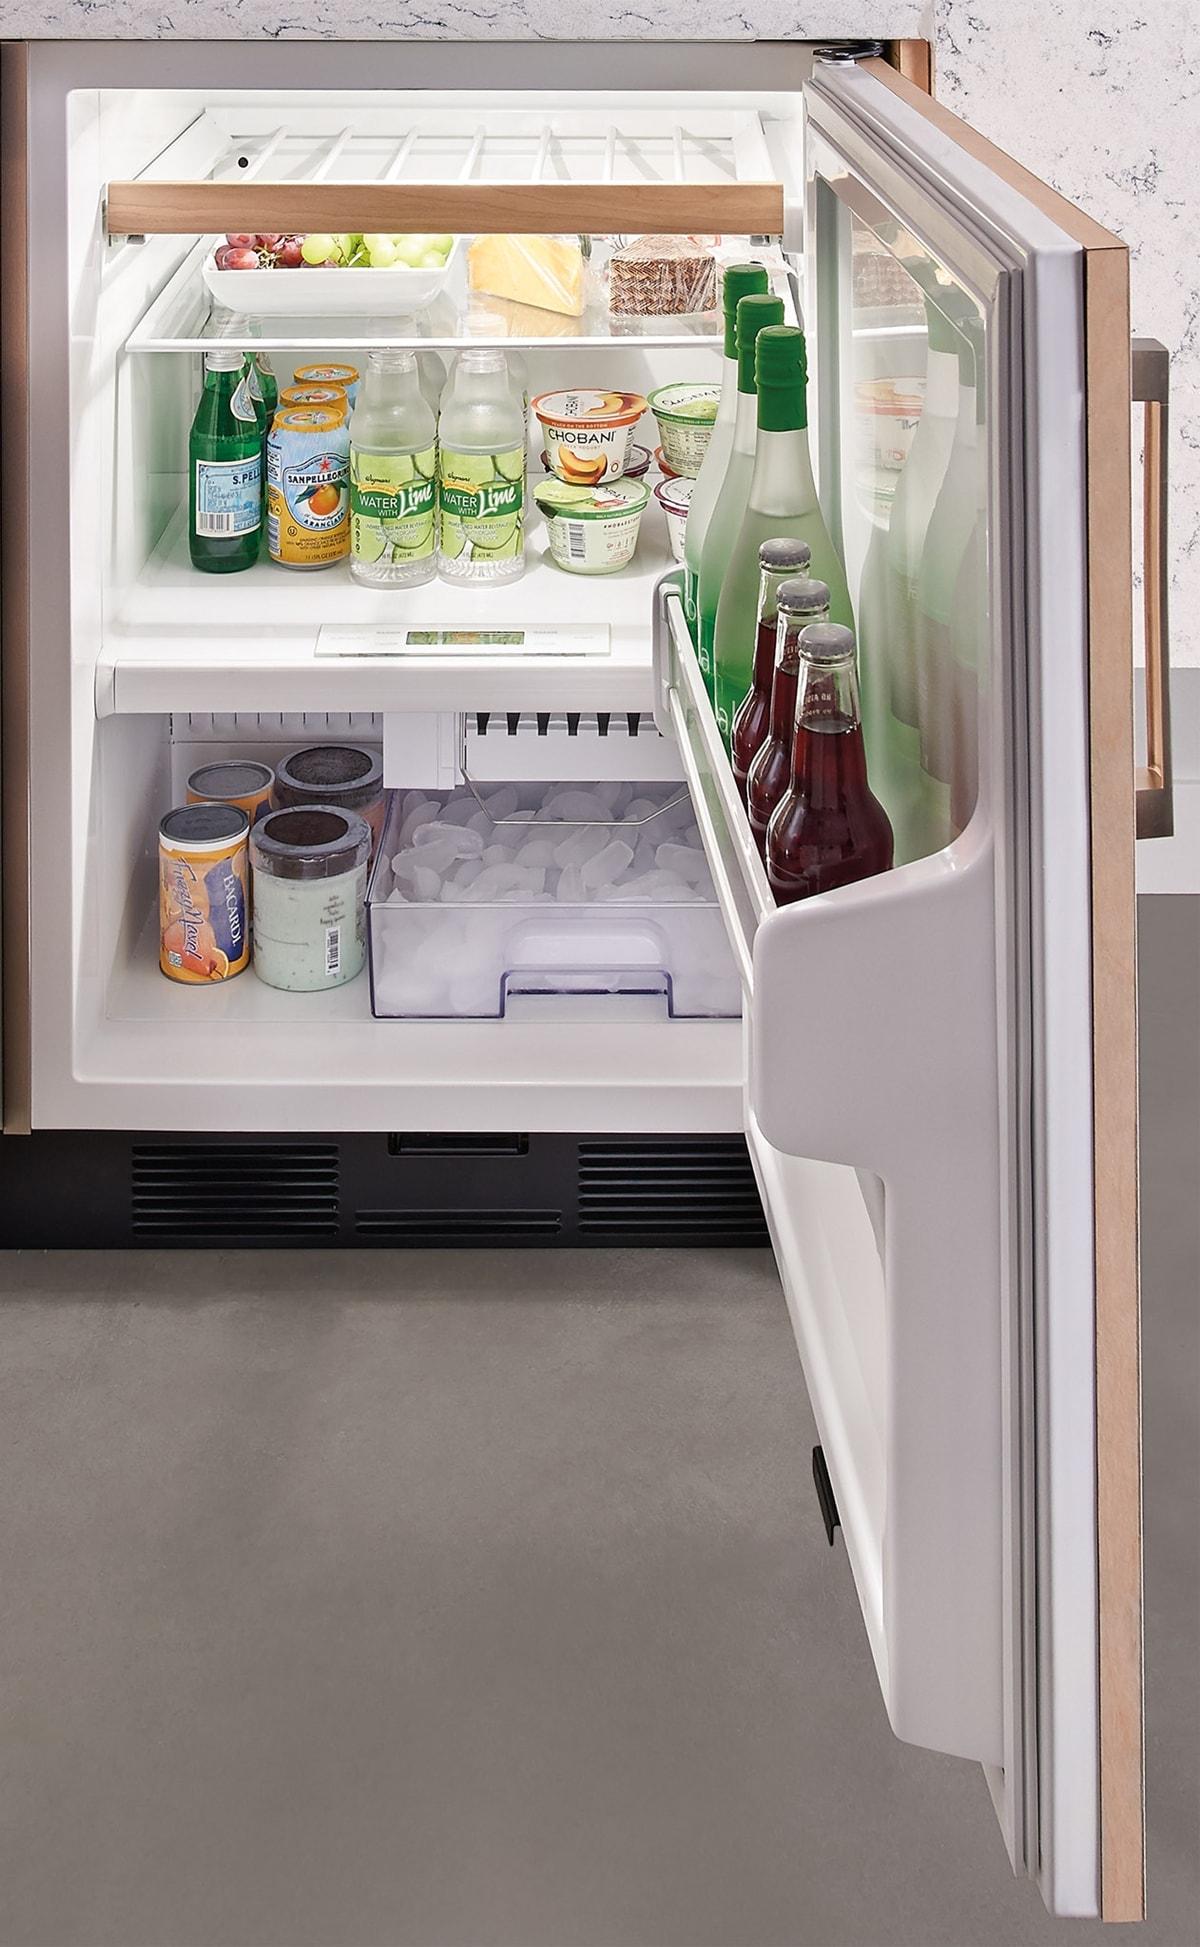 Sub Zero 24 Undercounter Refrigerator Freezer With Ice Maker